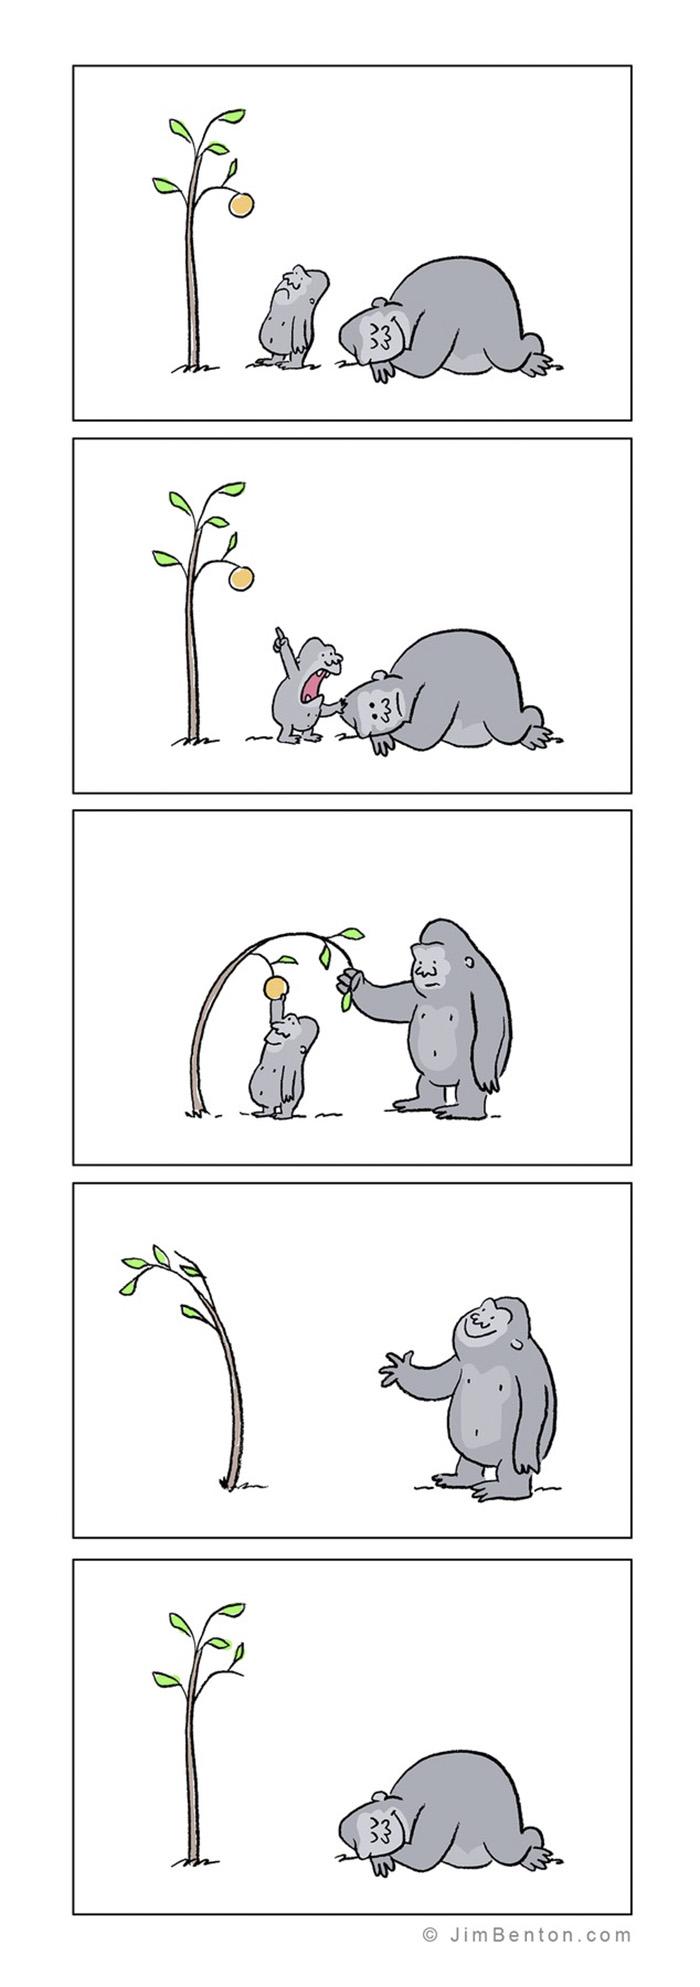 a-few-animal-cartoons-by-jim-benton-583c193c2b6a1__700